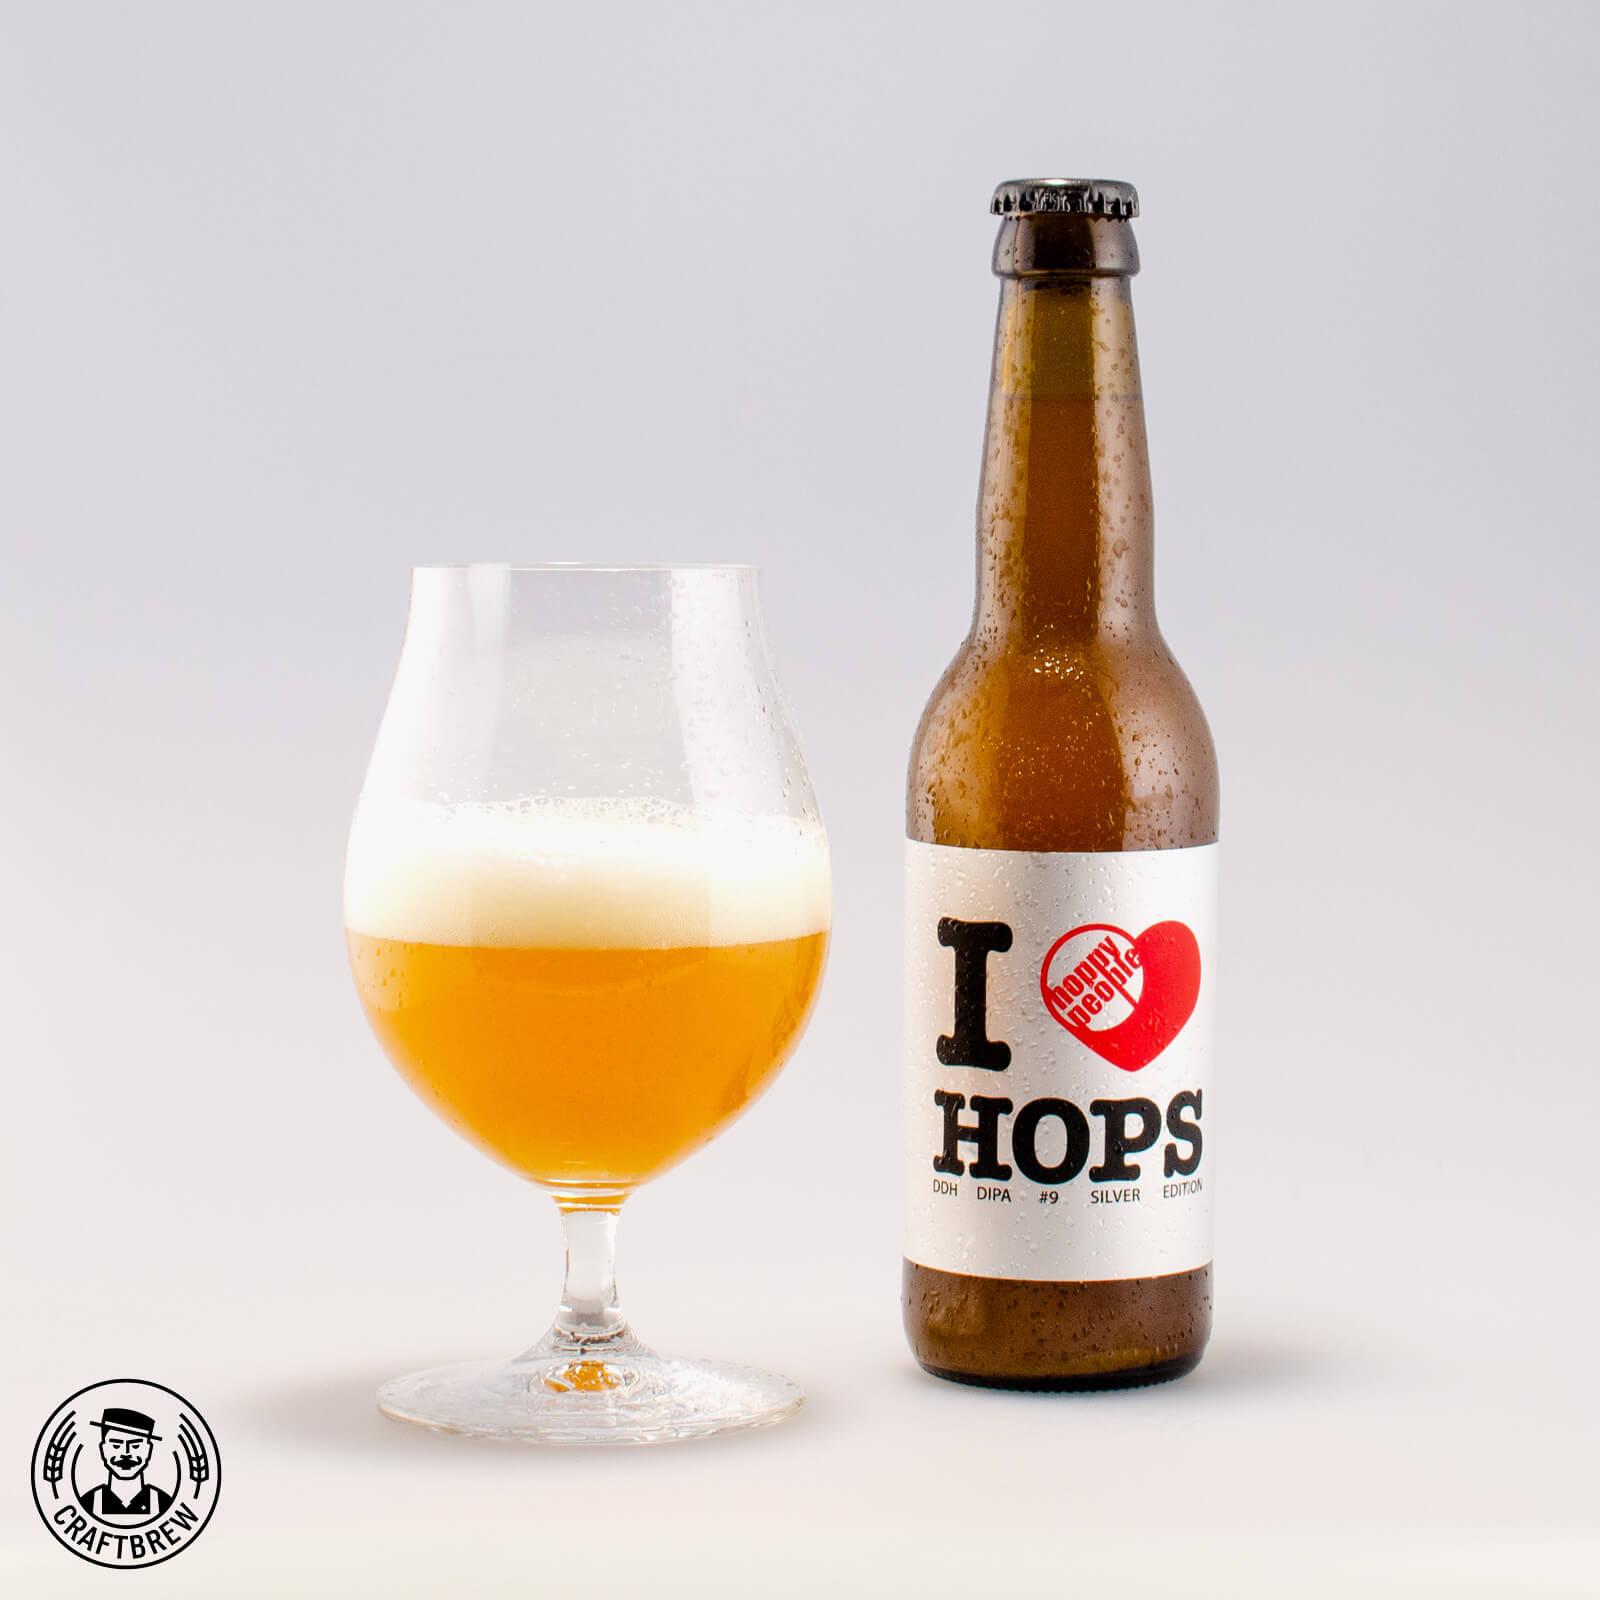 I Love Hops 9 - Hoppy People